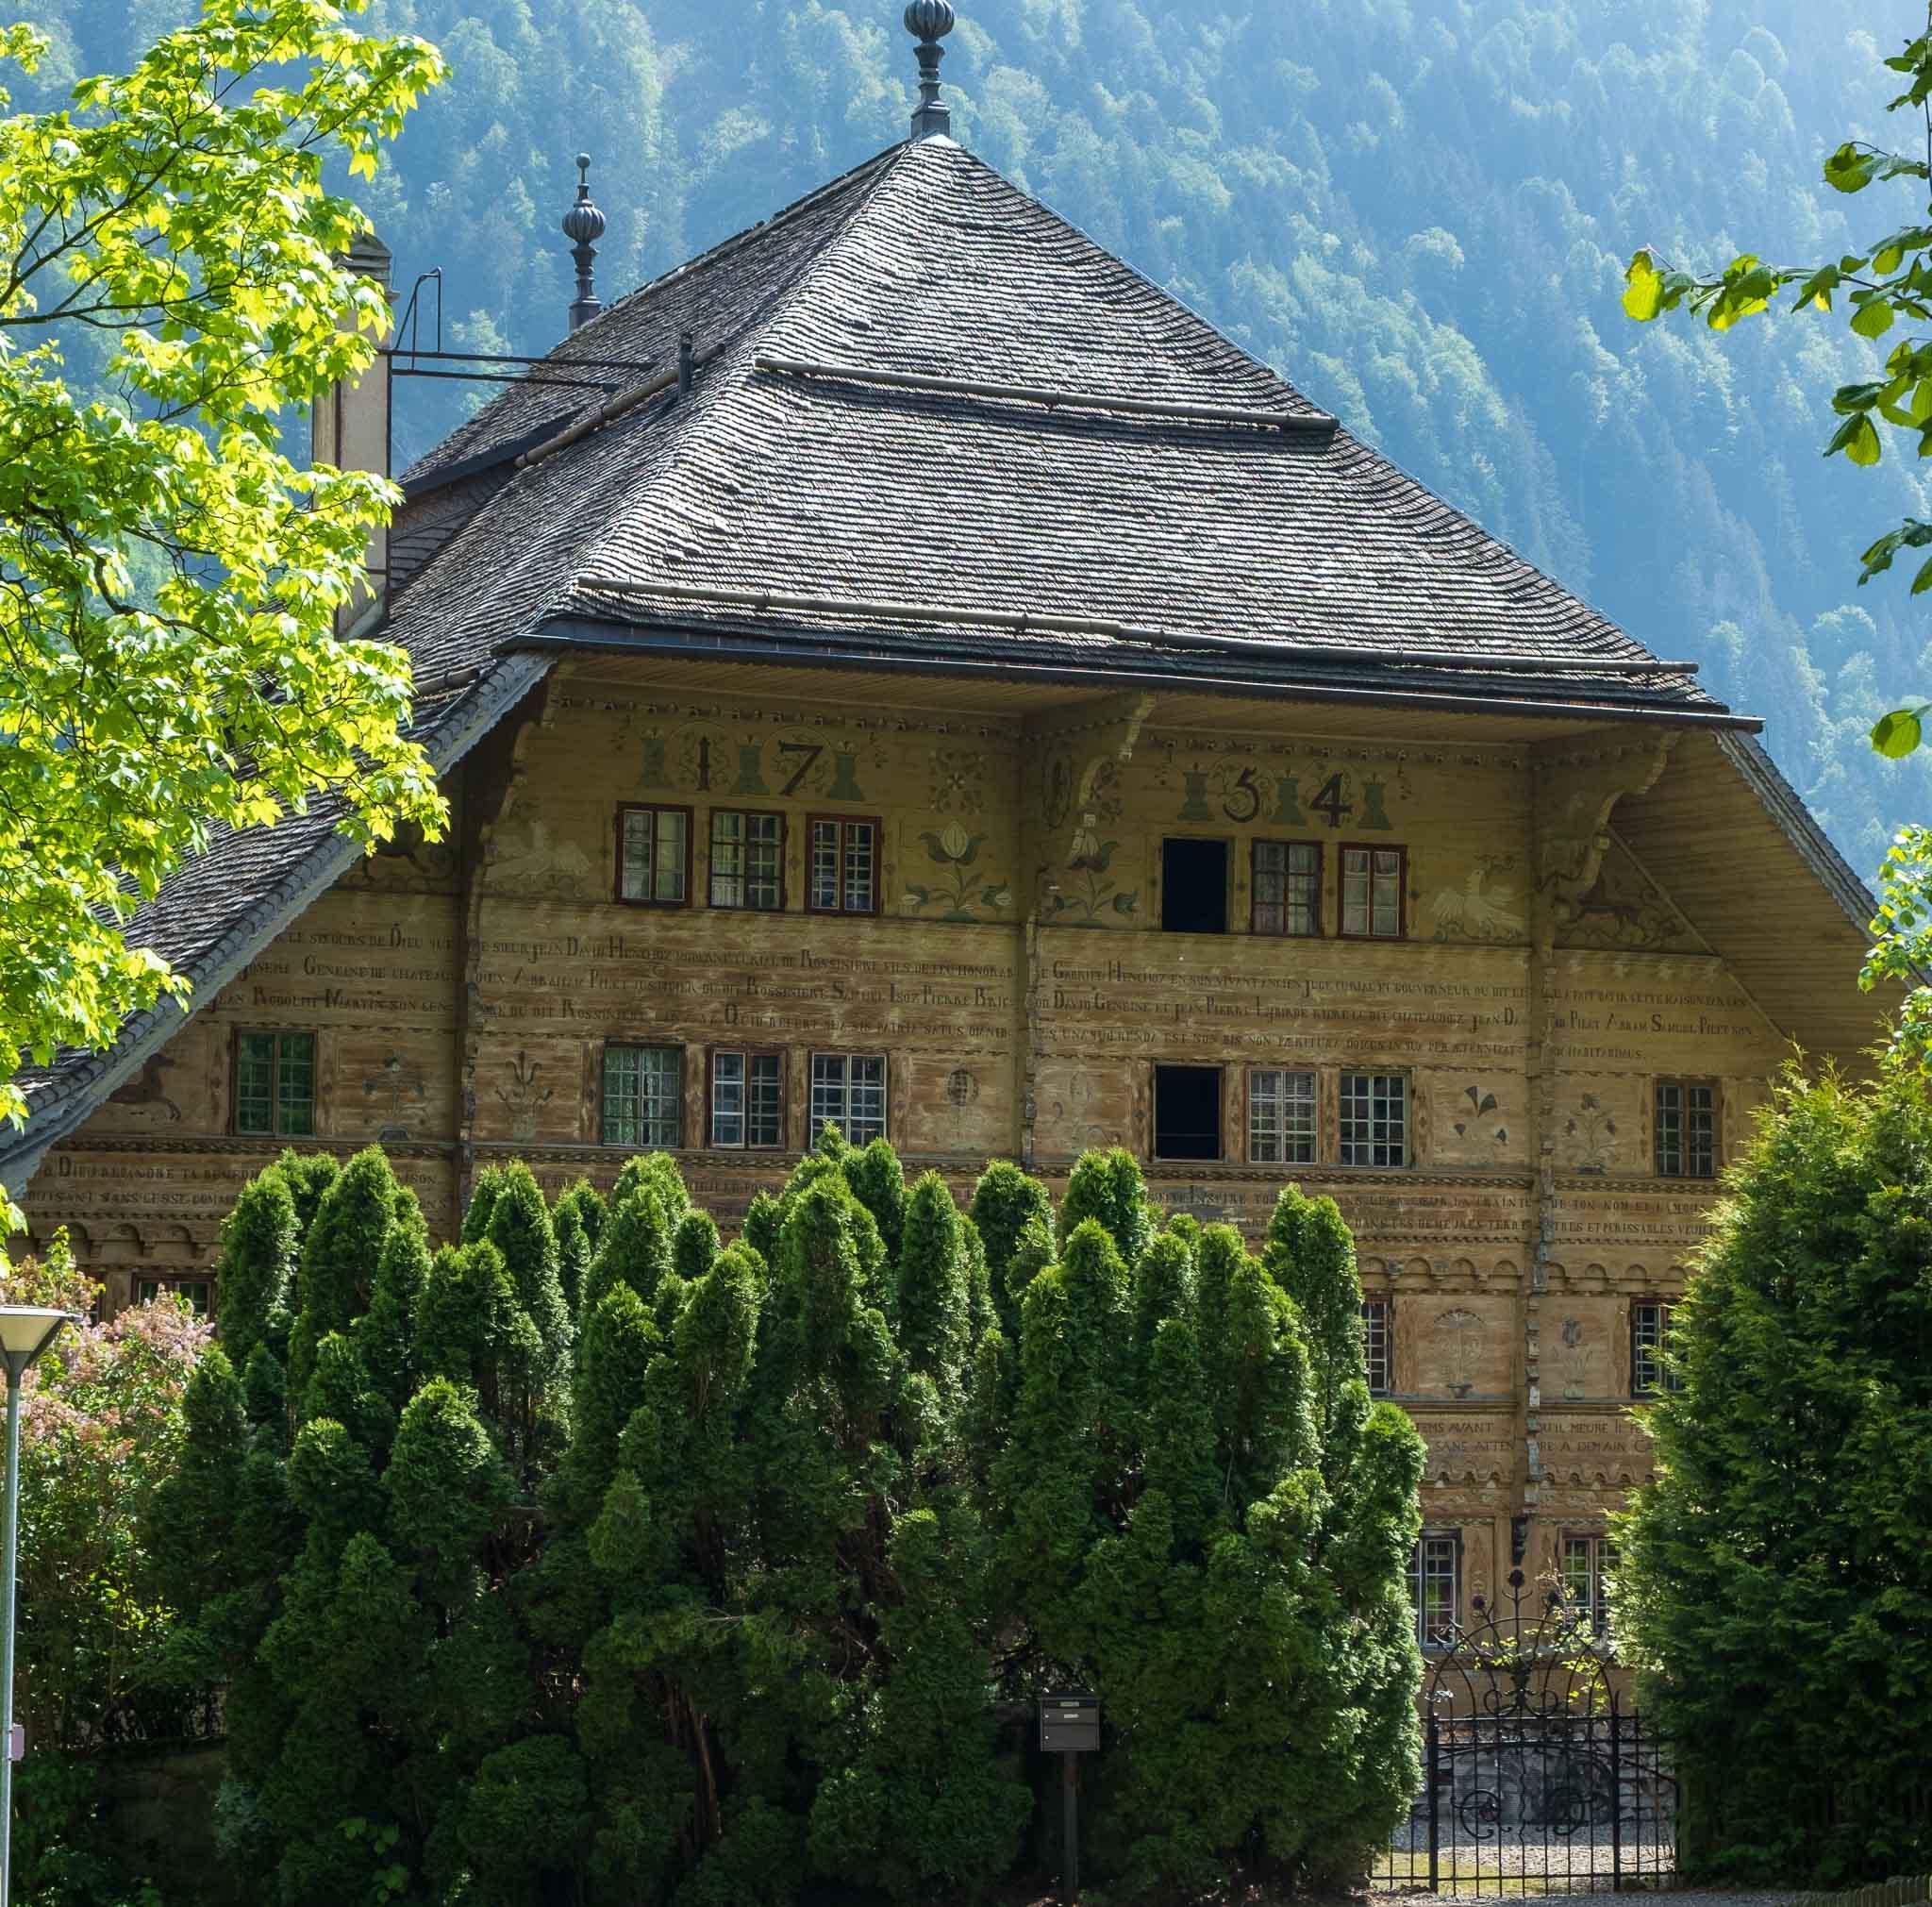 Front of the Grand Chalet on Rossinière audio tour Cowbells, Chalets and Balthus: A Swiss Alpine Village Excursion